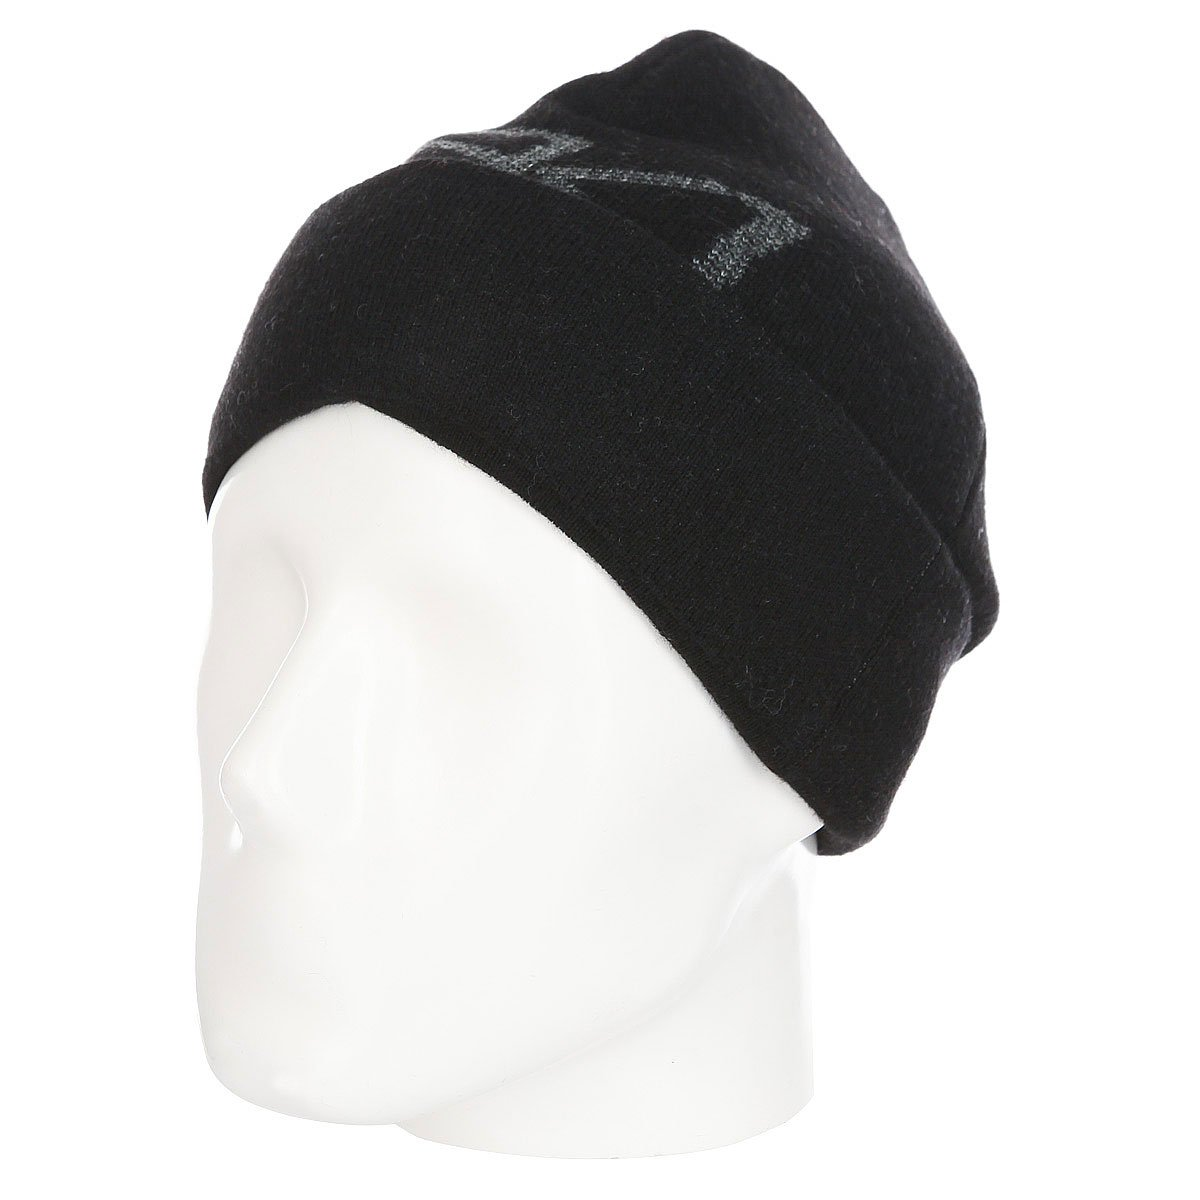 85fc3c463a5 Купить шапку Burton Ak Stagger 3 pack True Black в интернет-магазине ...